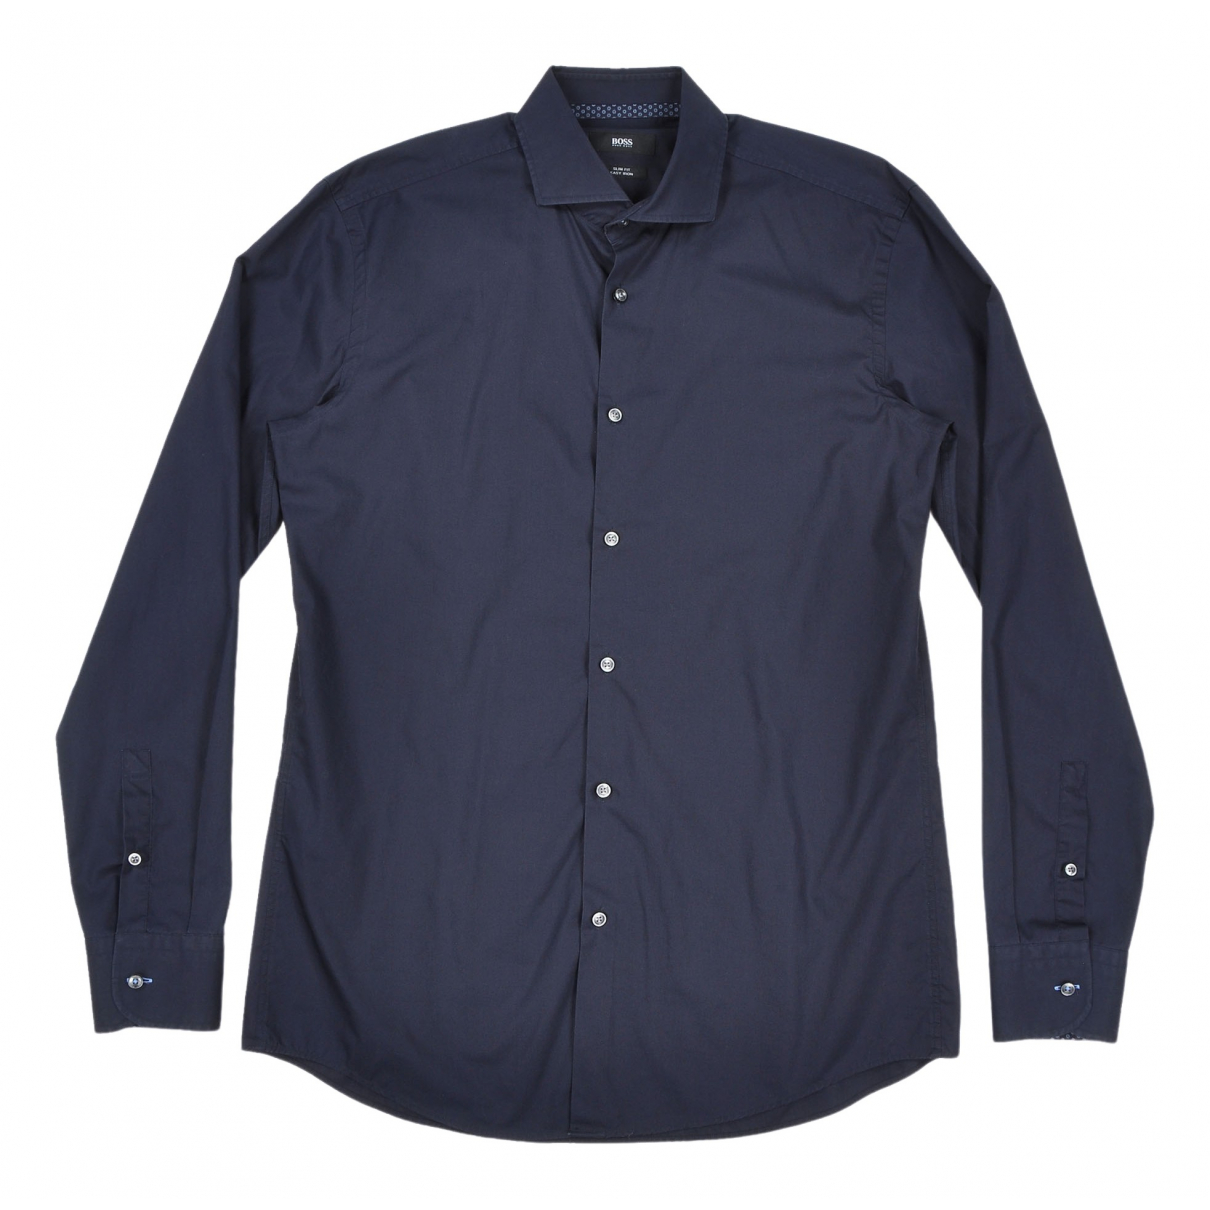 Boss \N Navy Cotton Shirts for Men 39 EU (tour de cou / collar)